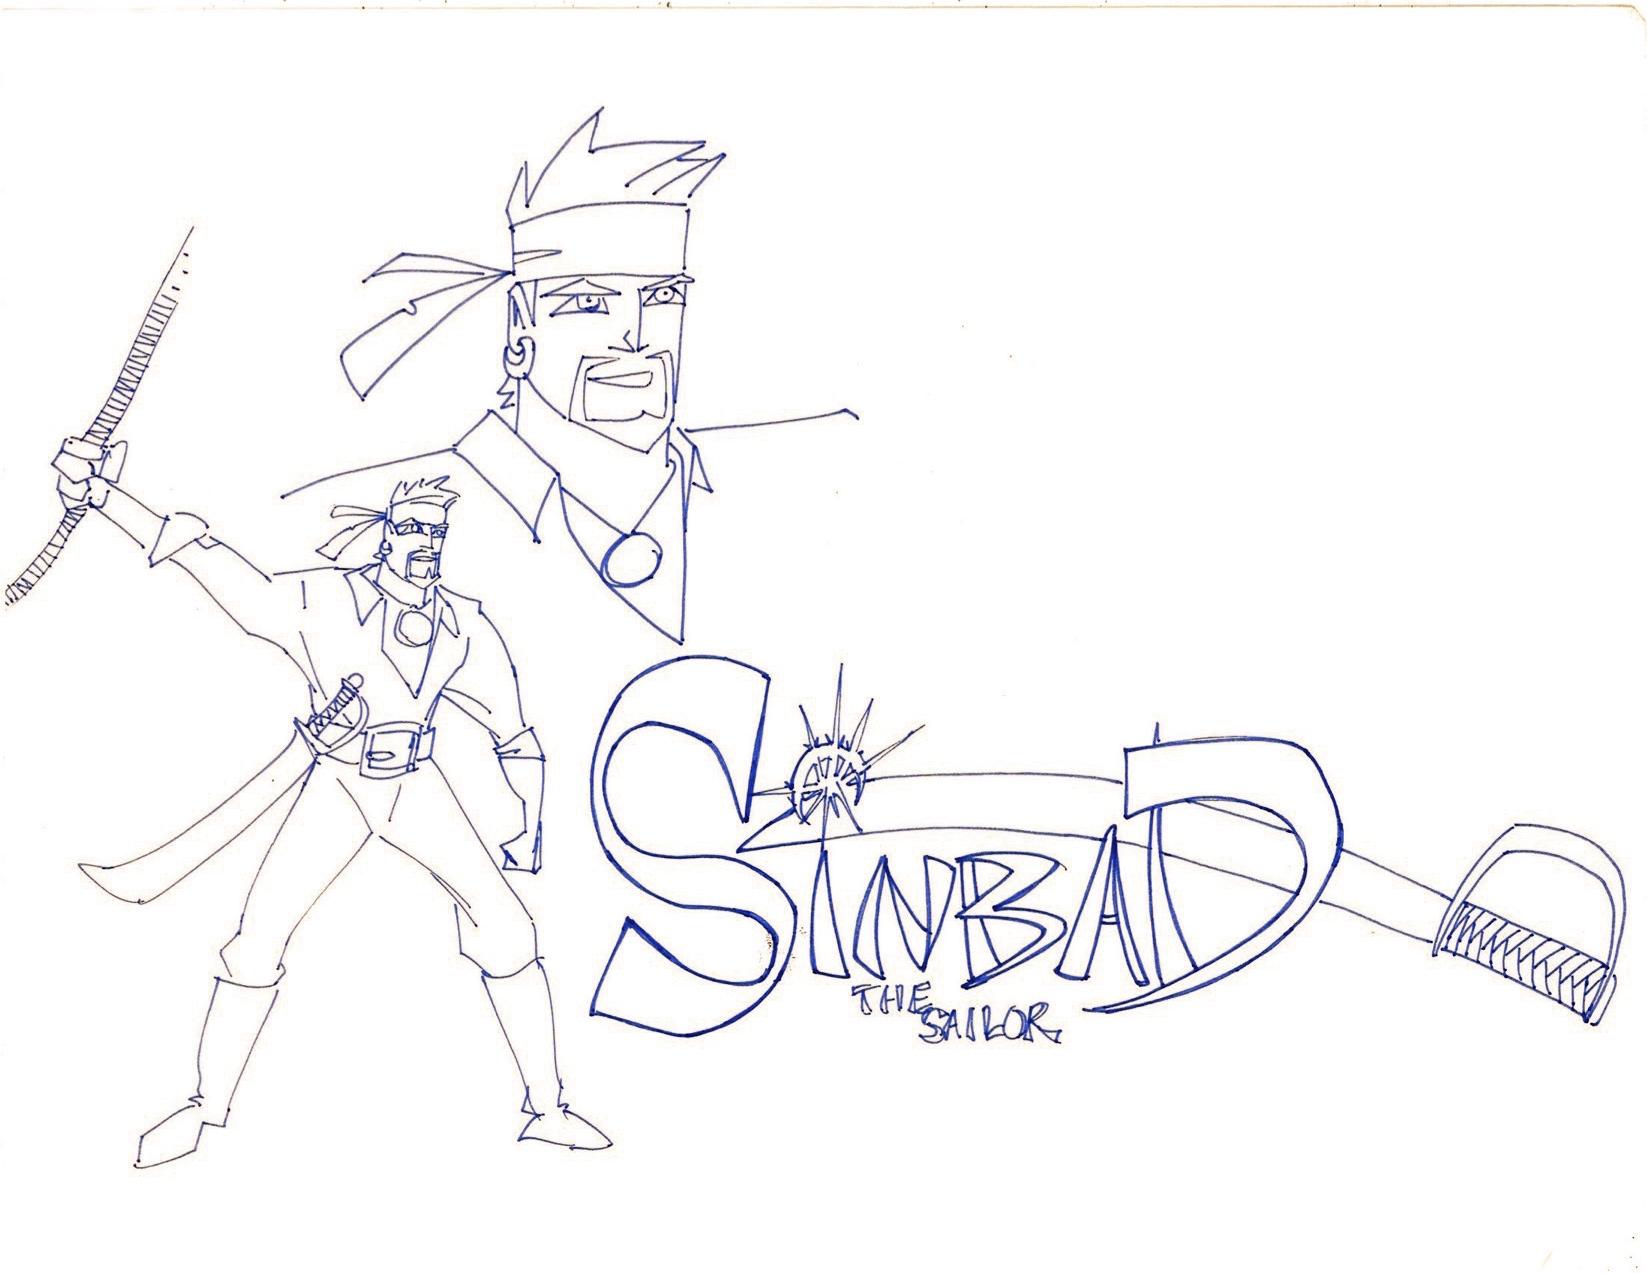 Disney animation inspired Sinbad, circa 1994